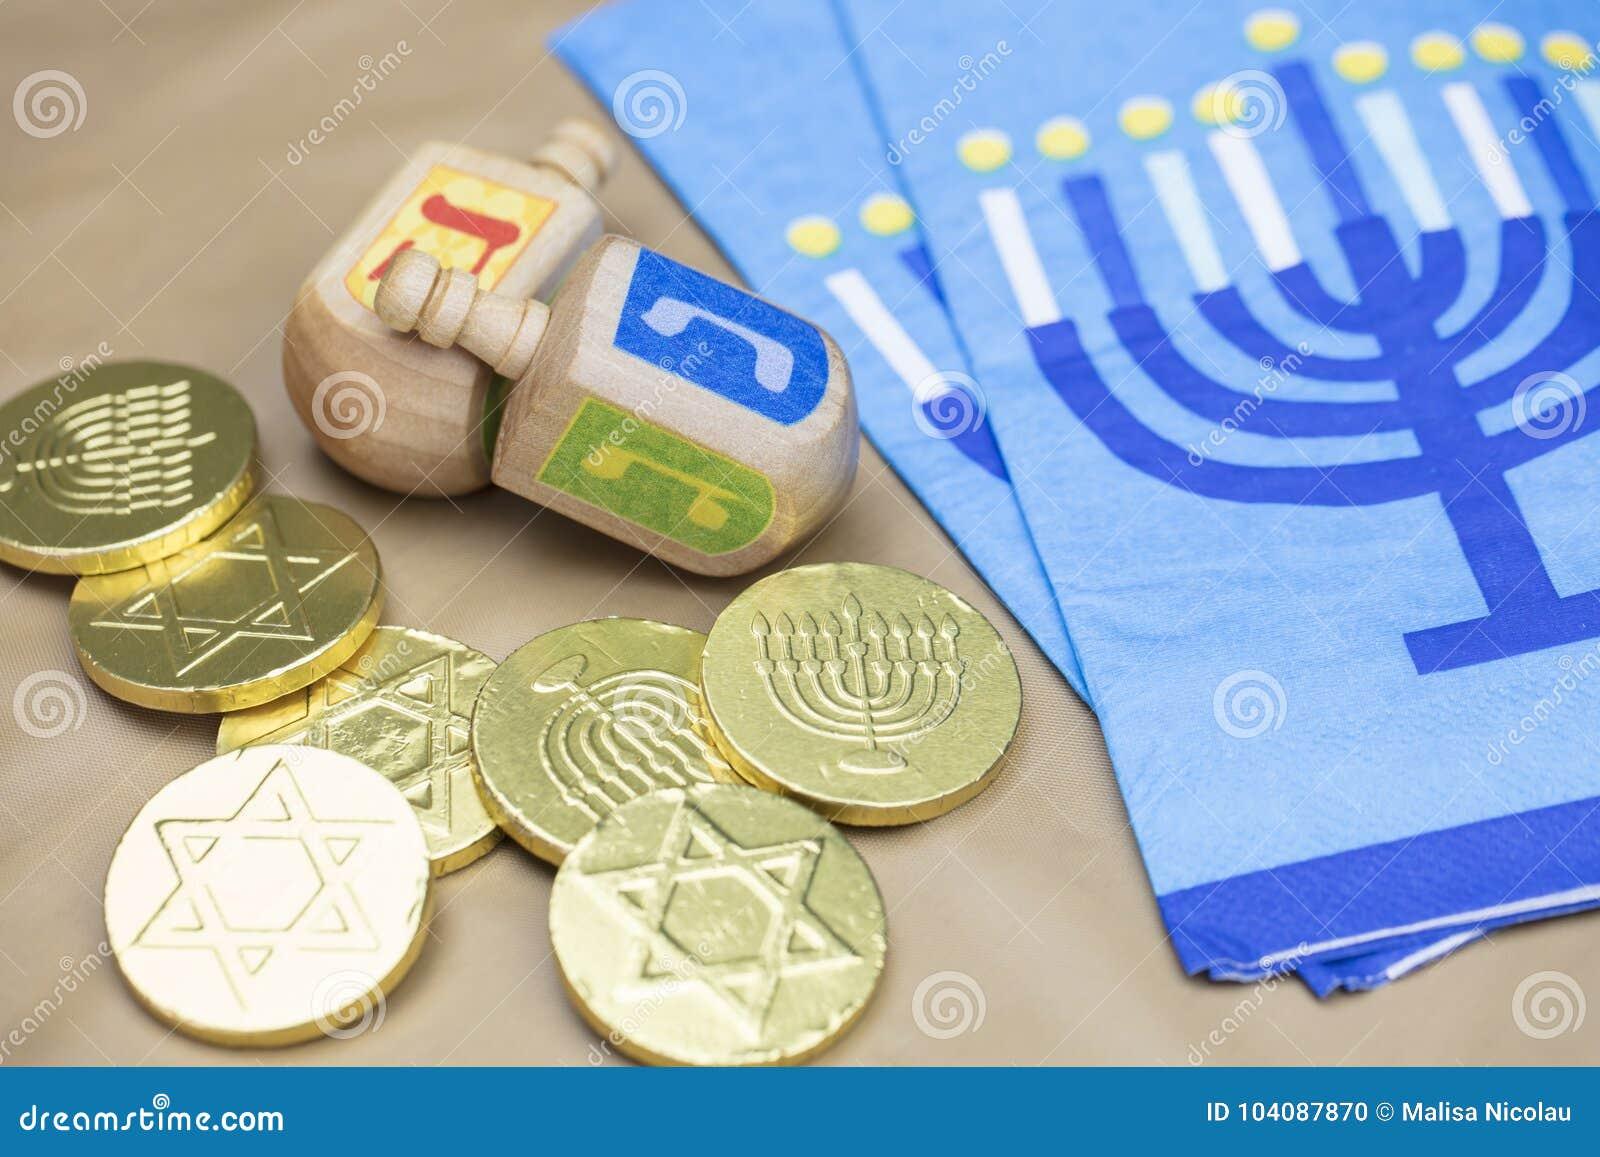 Hanukkah Dreidels, Napkins and Chocolate Gelt Coins